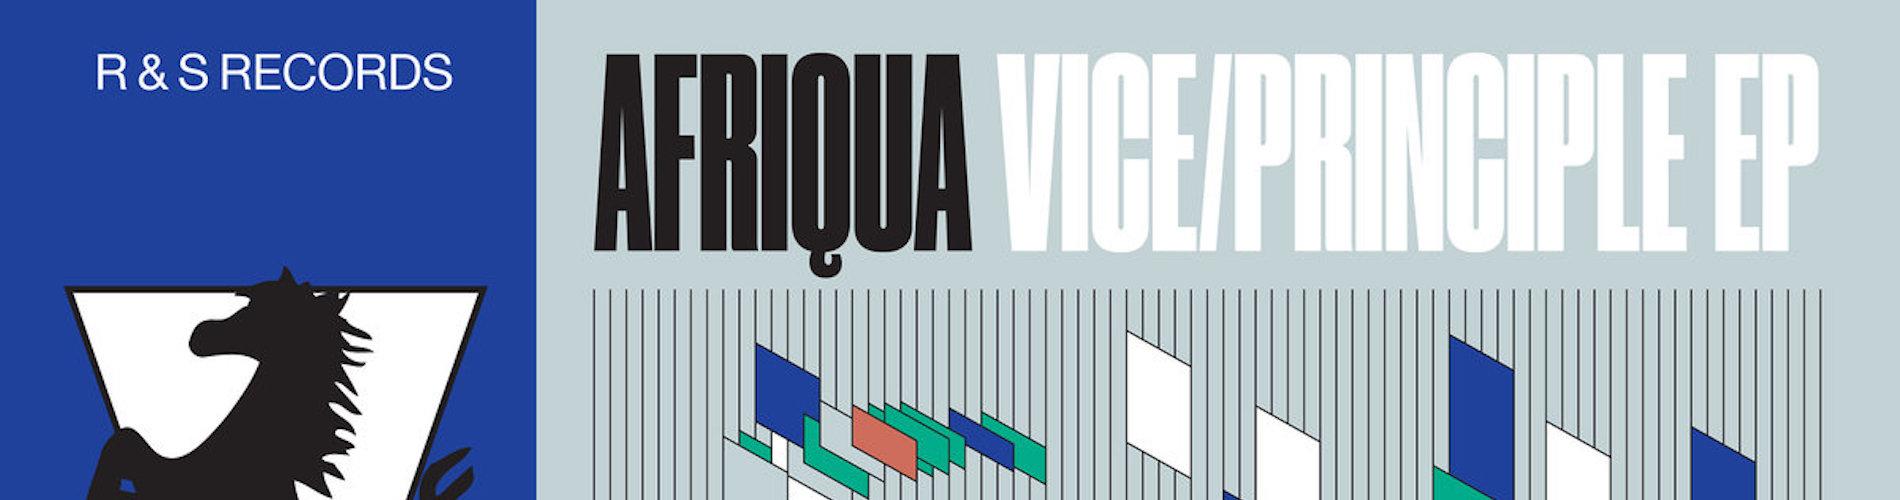 Afriqua-Vice-Principle-copy